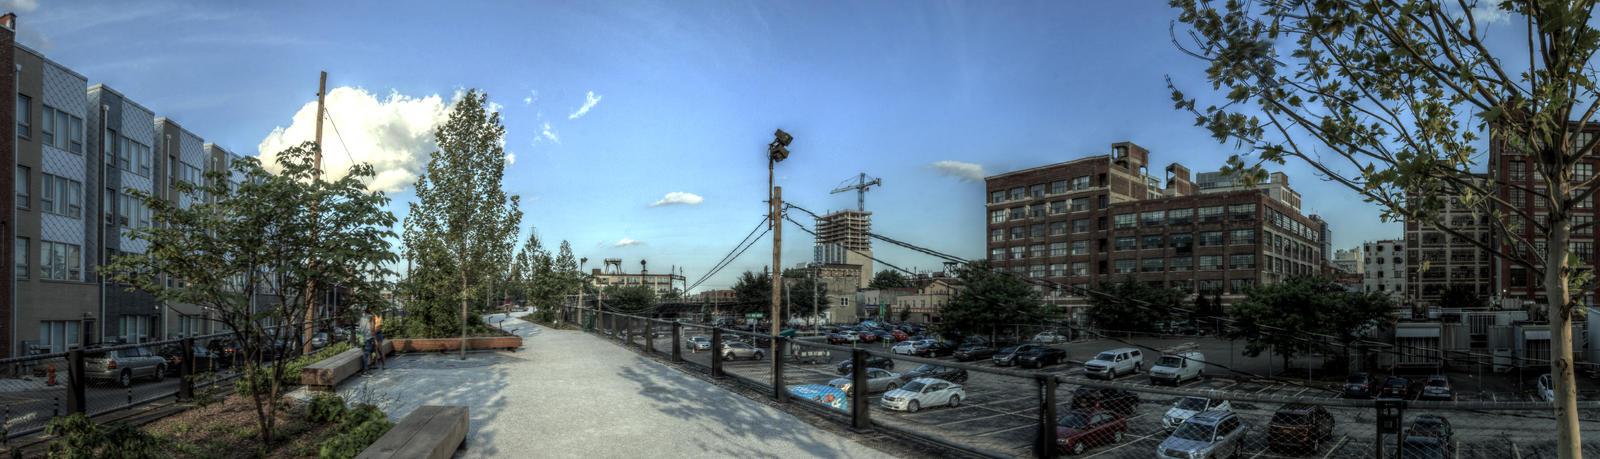 Panorama 3673 hdr pregamma 1 mantiuk06 contrast ma